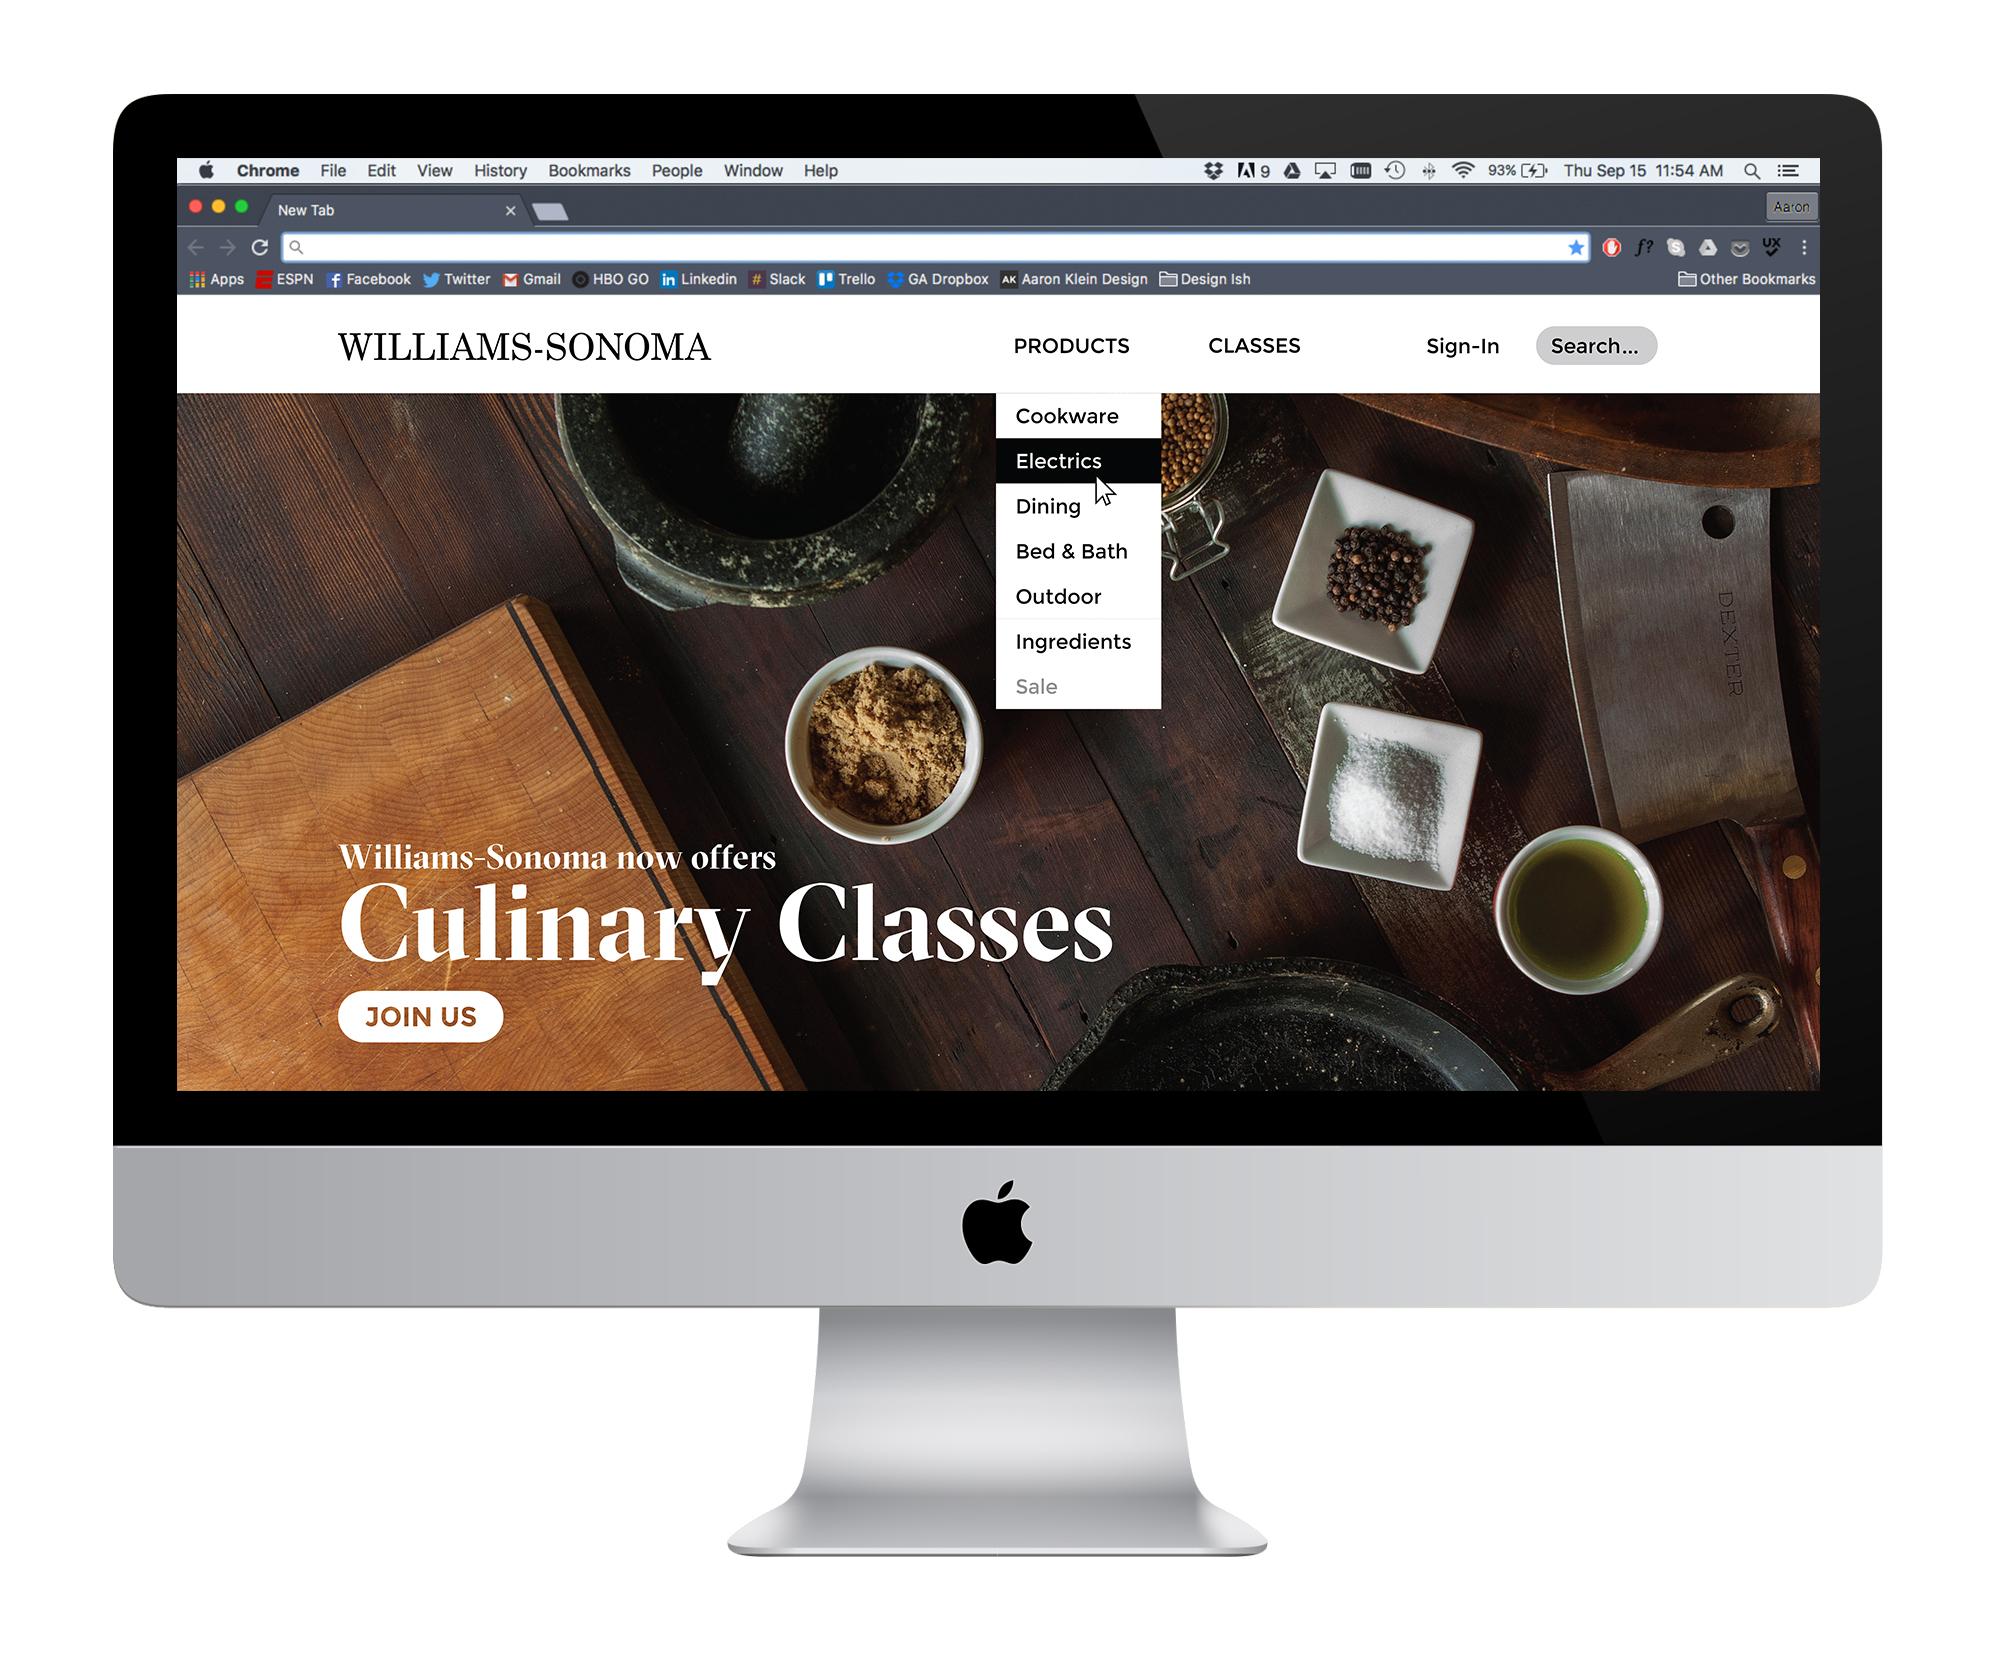 Williams-Sonoma site design - Williams-Sonoma - concept